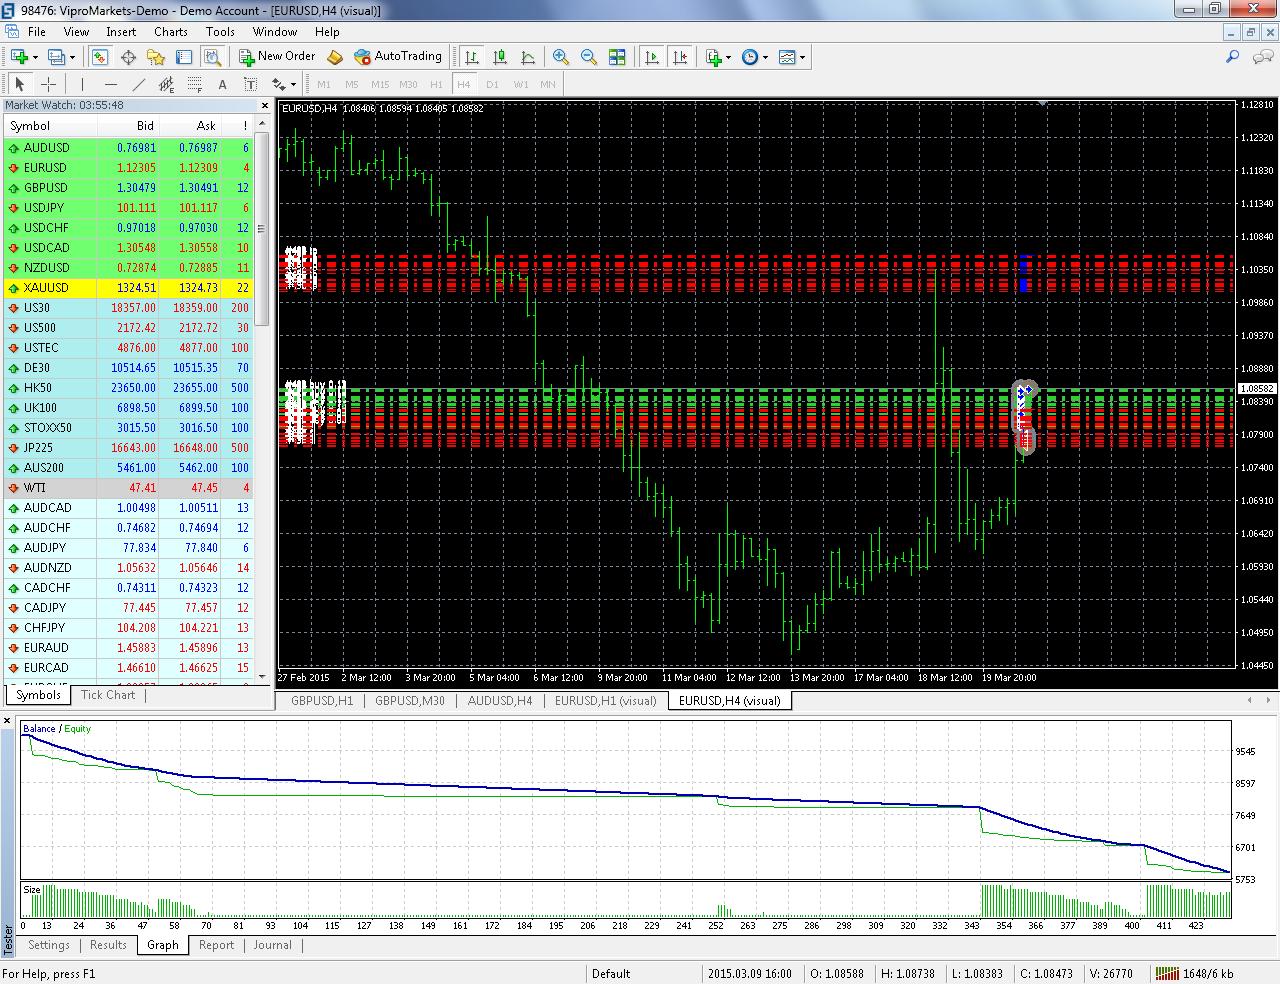 eurusd-h4-vipro-markets-ltd.